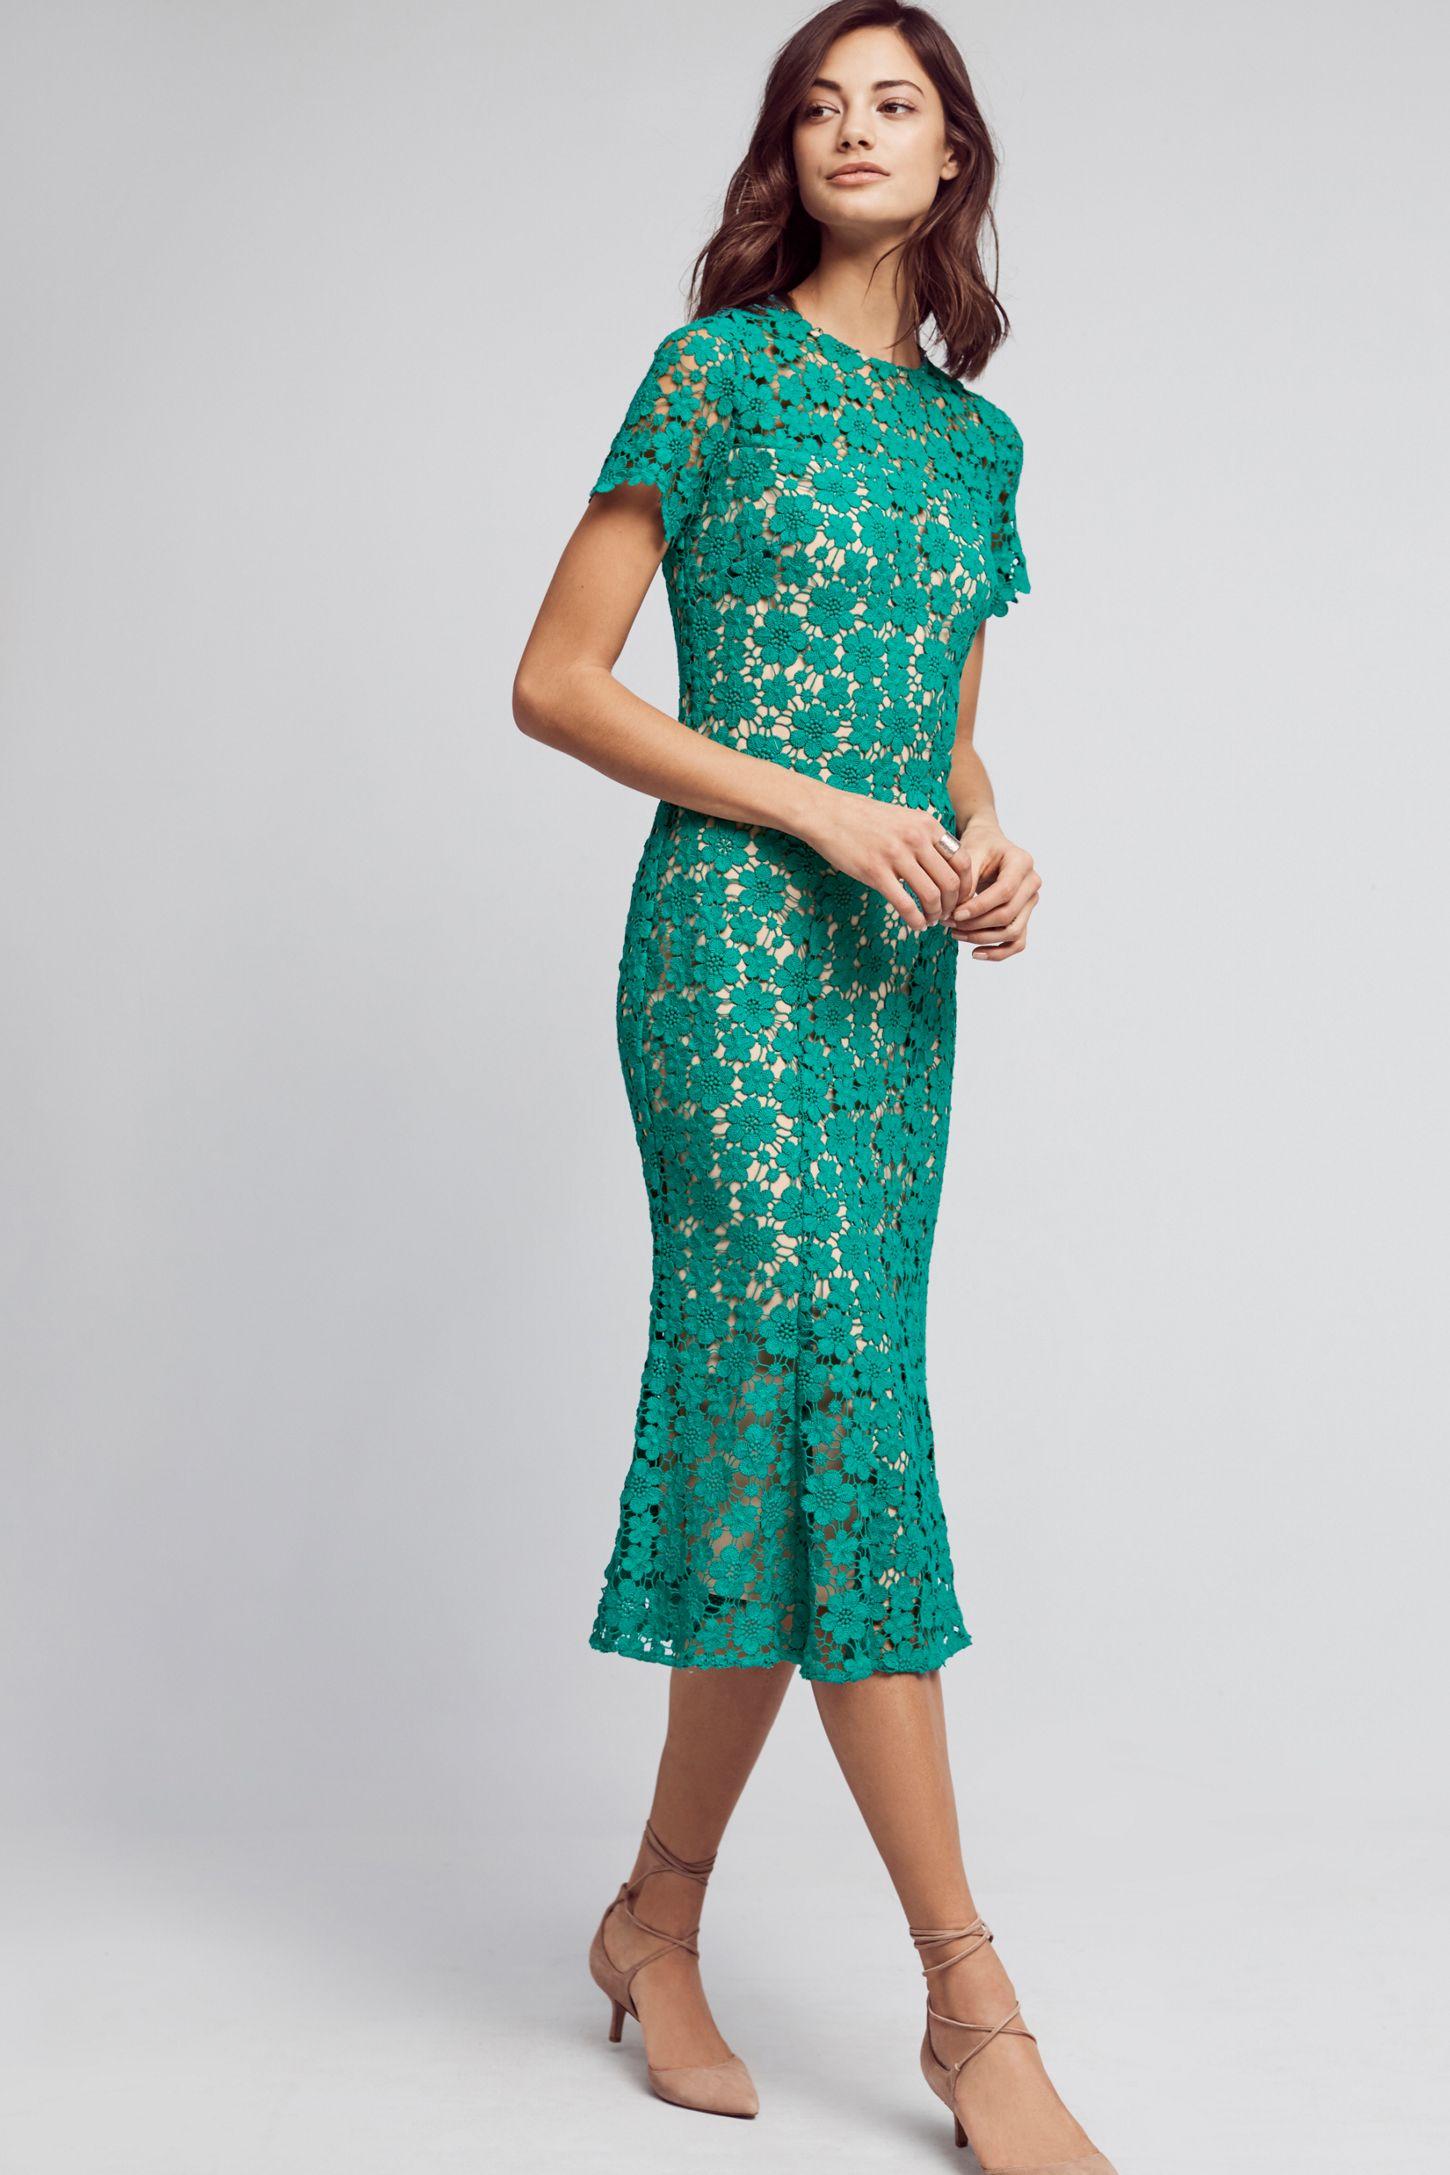 8dec4f1d9631 Symphony Lace Midi Dress | Anthropologie